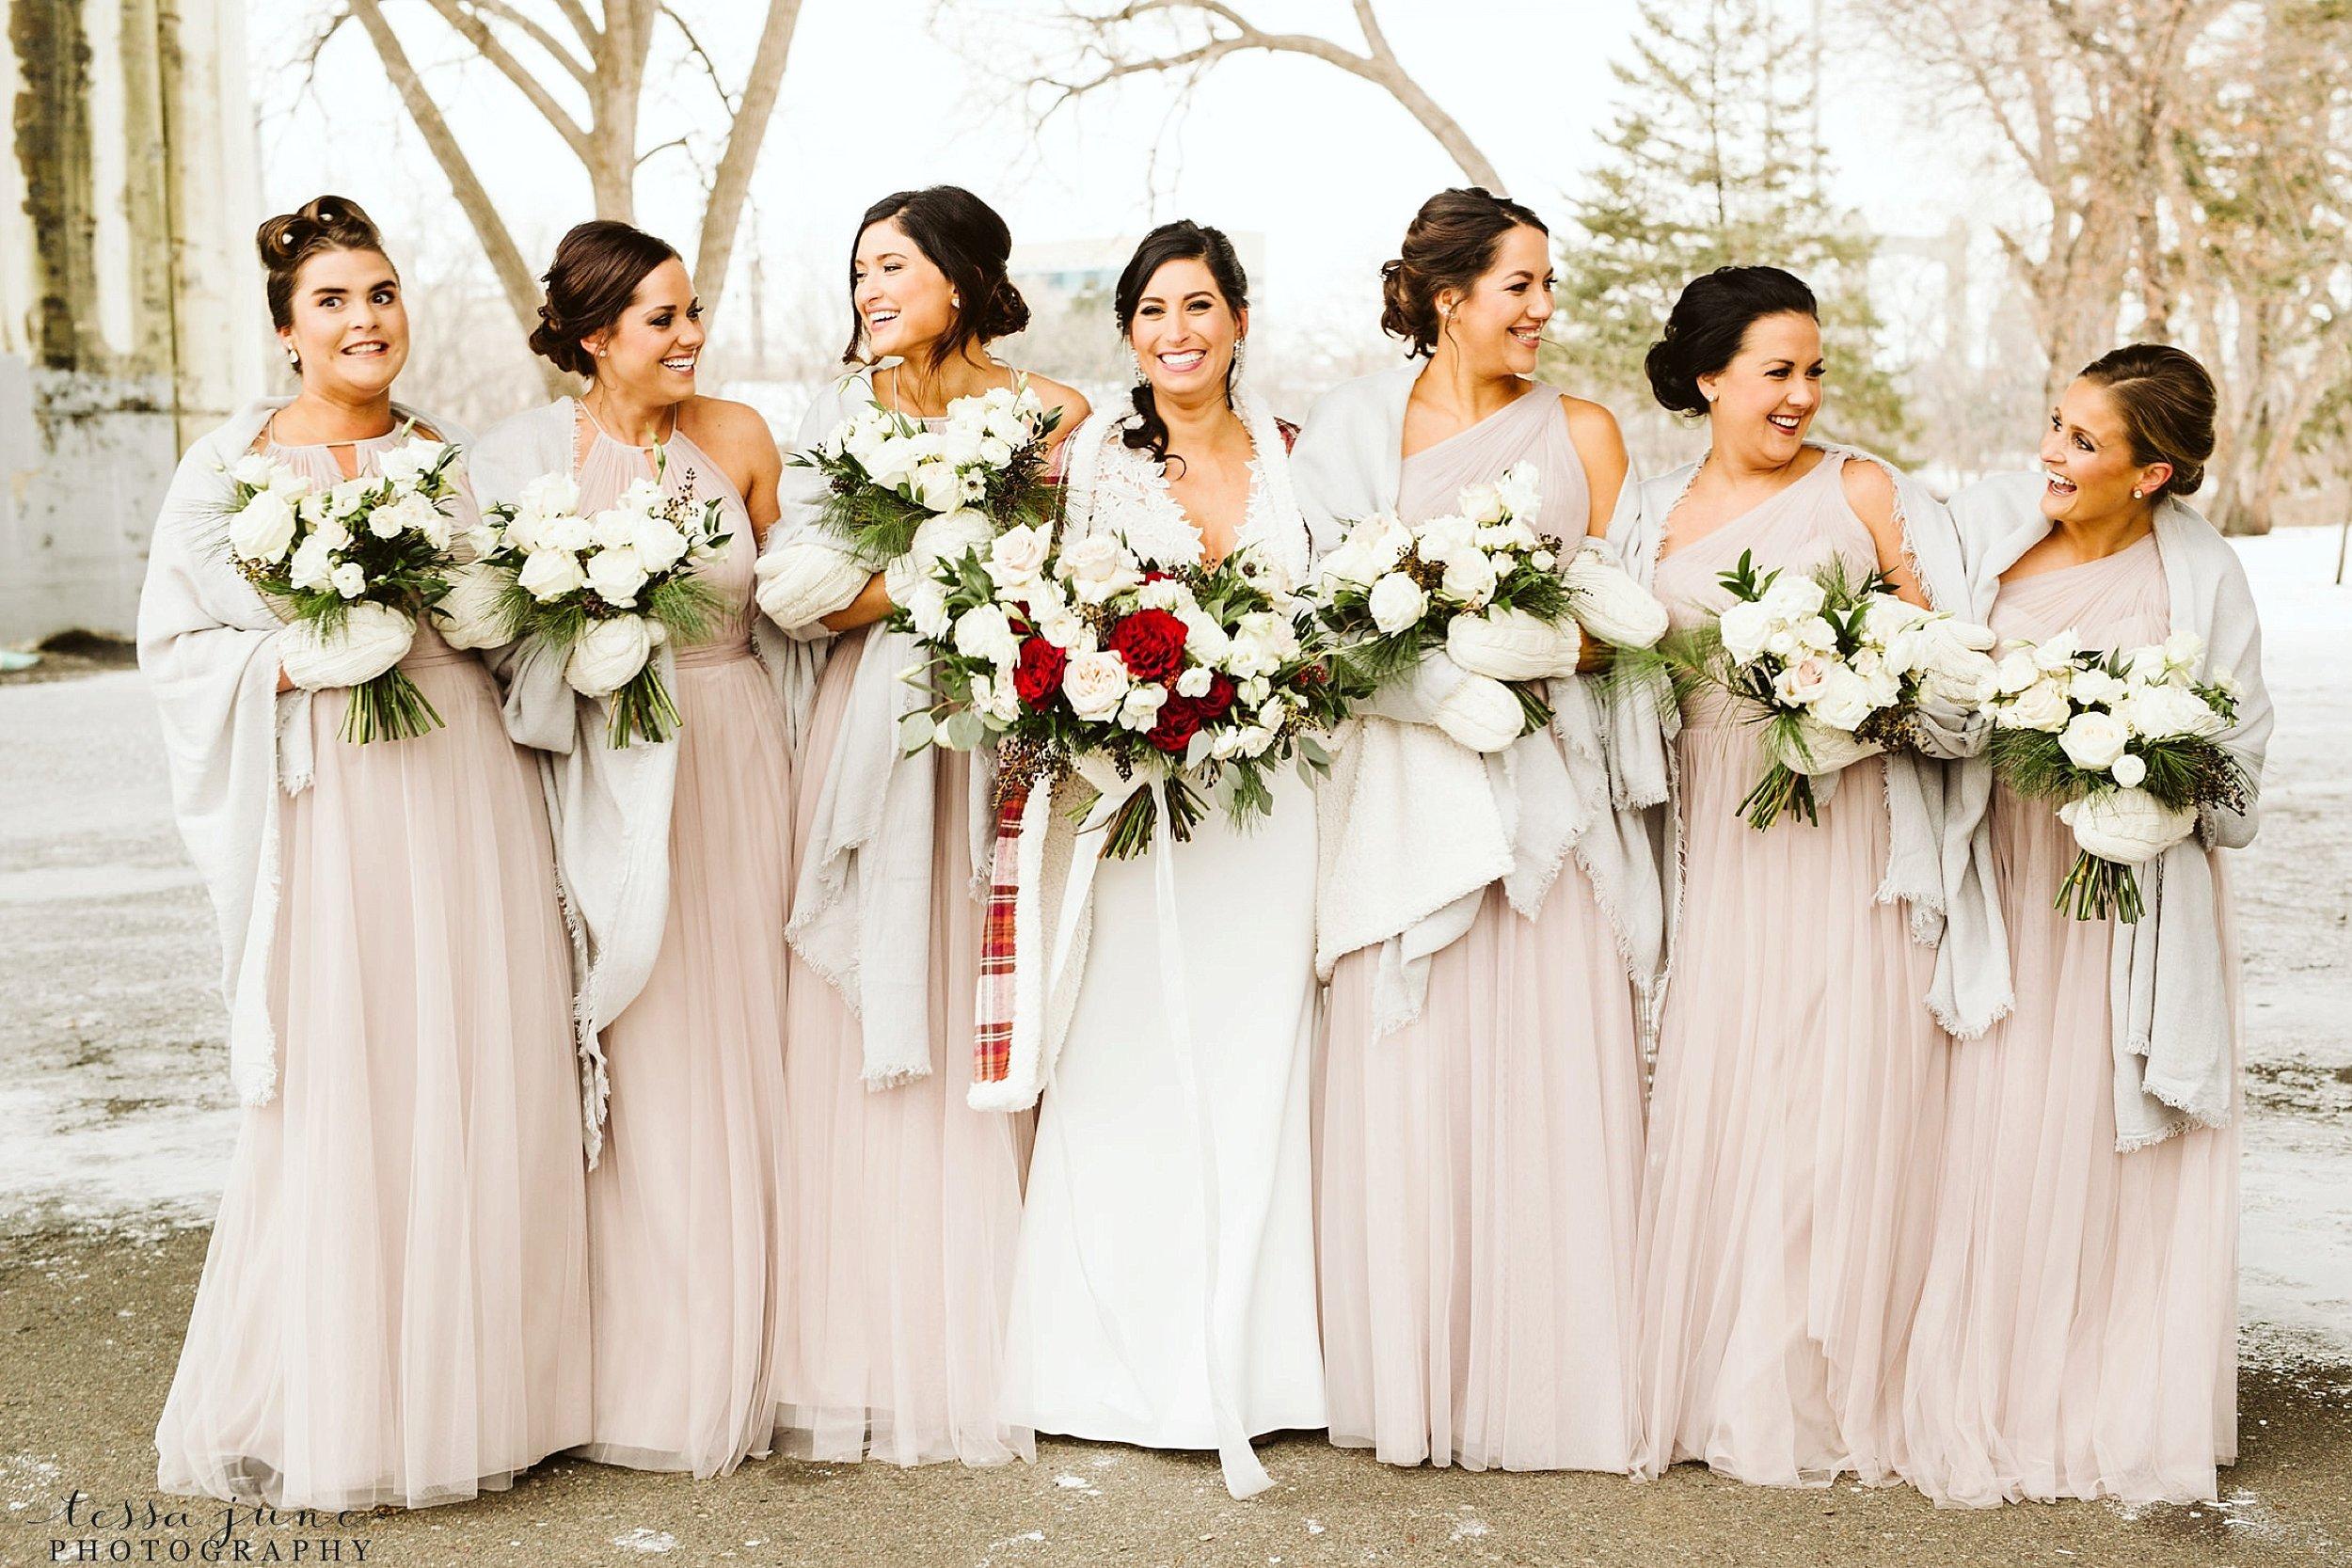 minneapolis-event-center-winter-romantic-snow-wedding-december-117.jpg